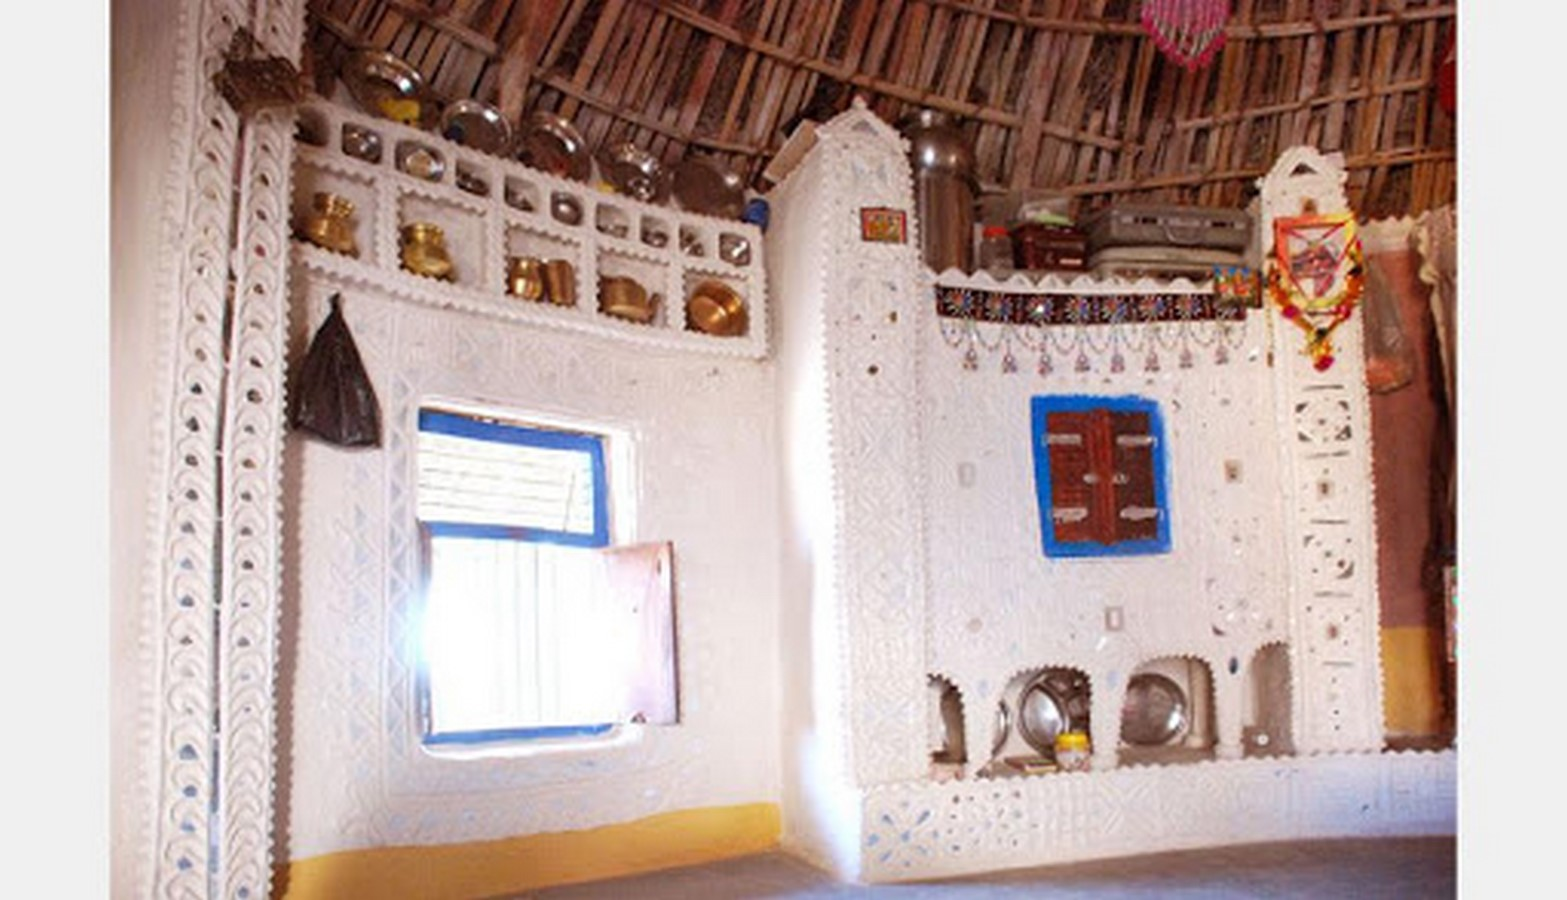 BHUNGA FROM KUTCH DISTRICT OF GUJARAT - Sheet1